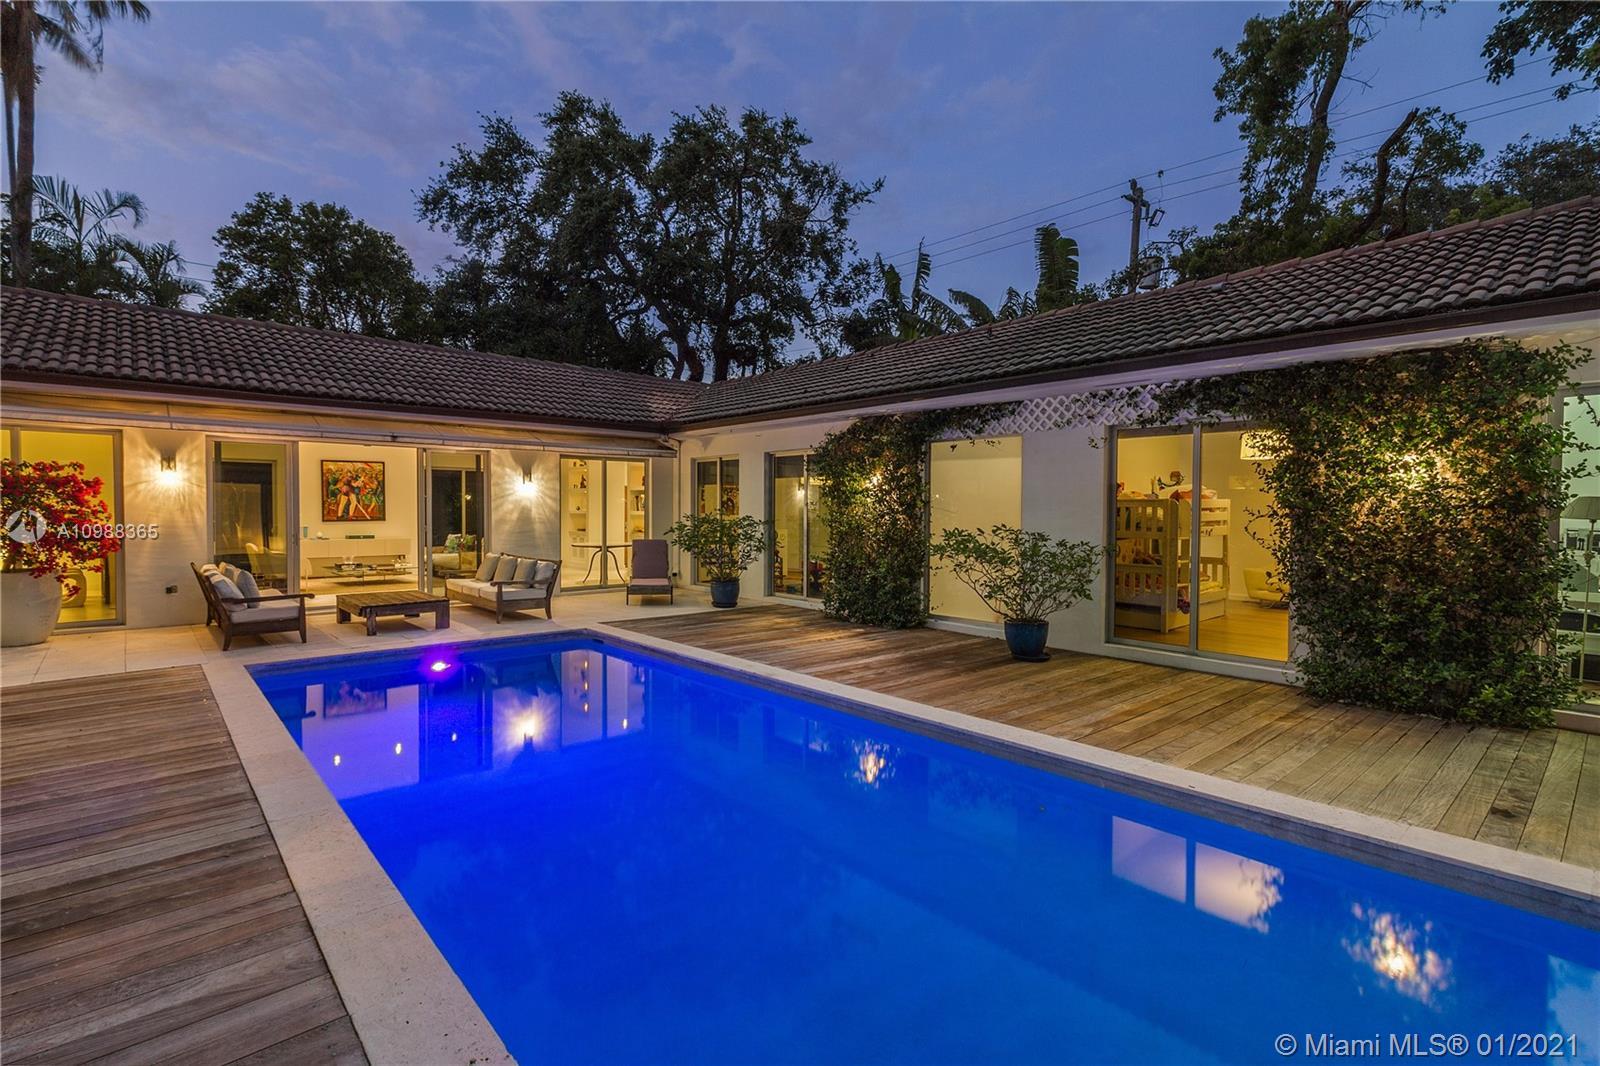 3200 Ah We Wa St, Miami, Florida 33133, 5 Bedrooms Bedrooms, ,5 BathroomsBathrooms,Residential,For Sale,3200 Ah We Wa St,A10988365